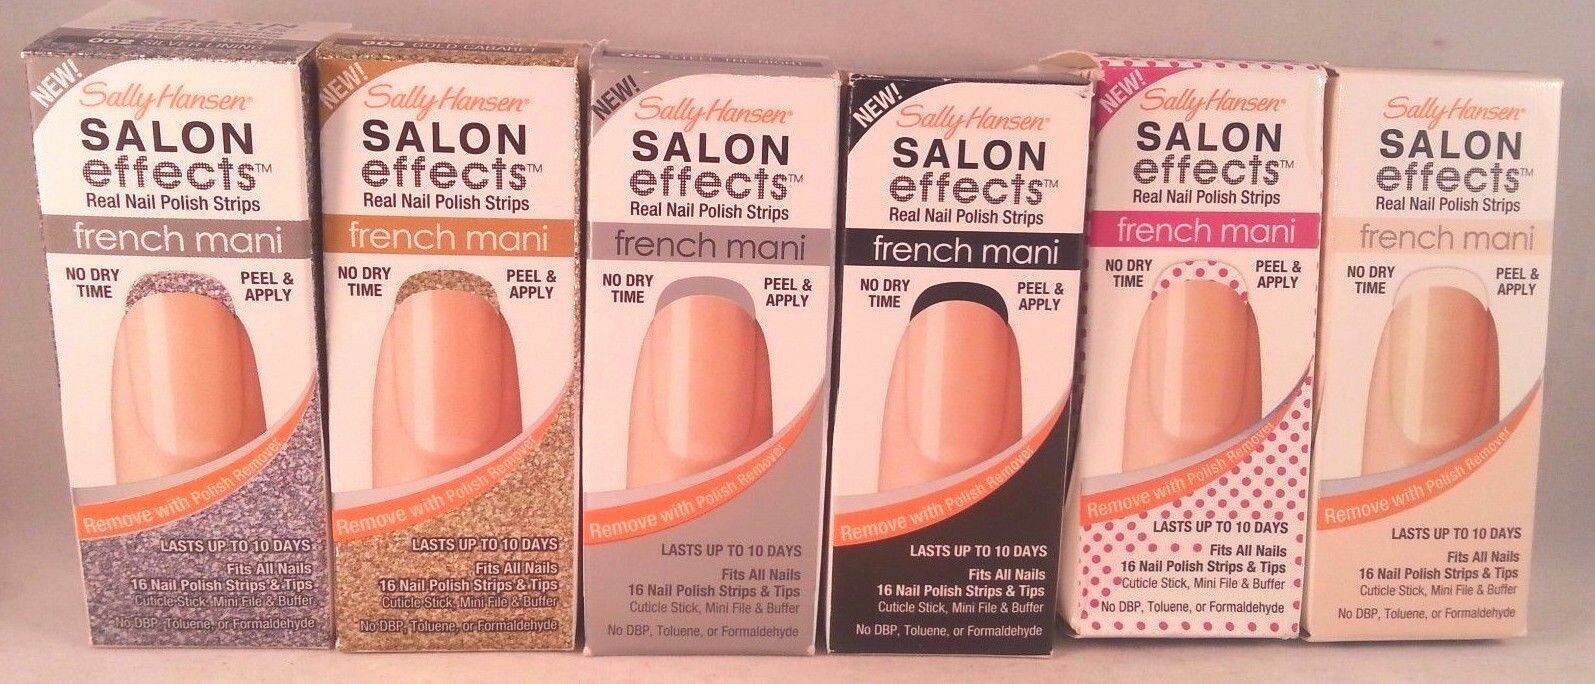 Sally Hansen Wild Child Salon Effects Real Nail Polish Strips 310 ...